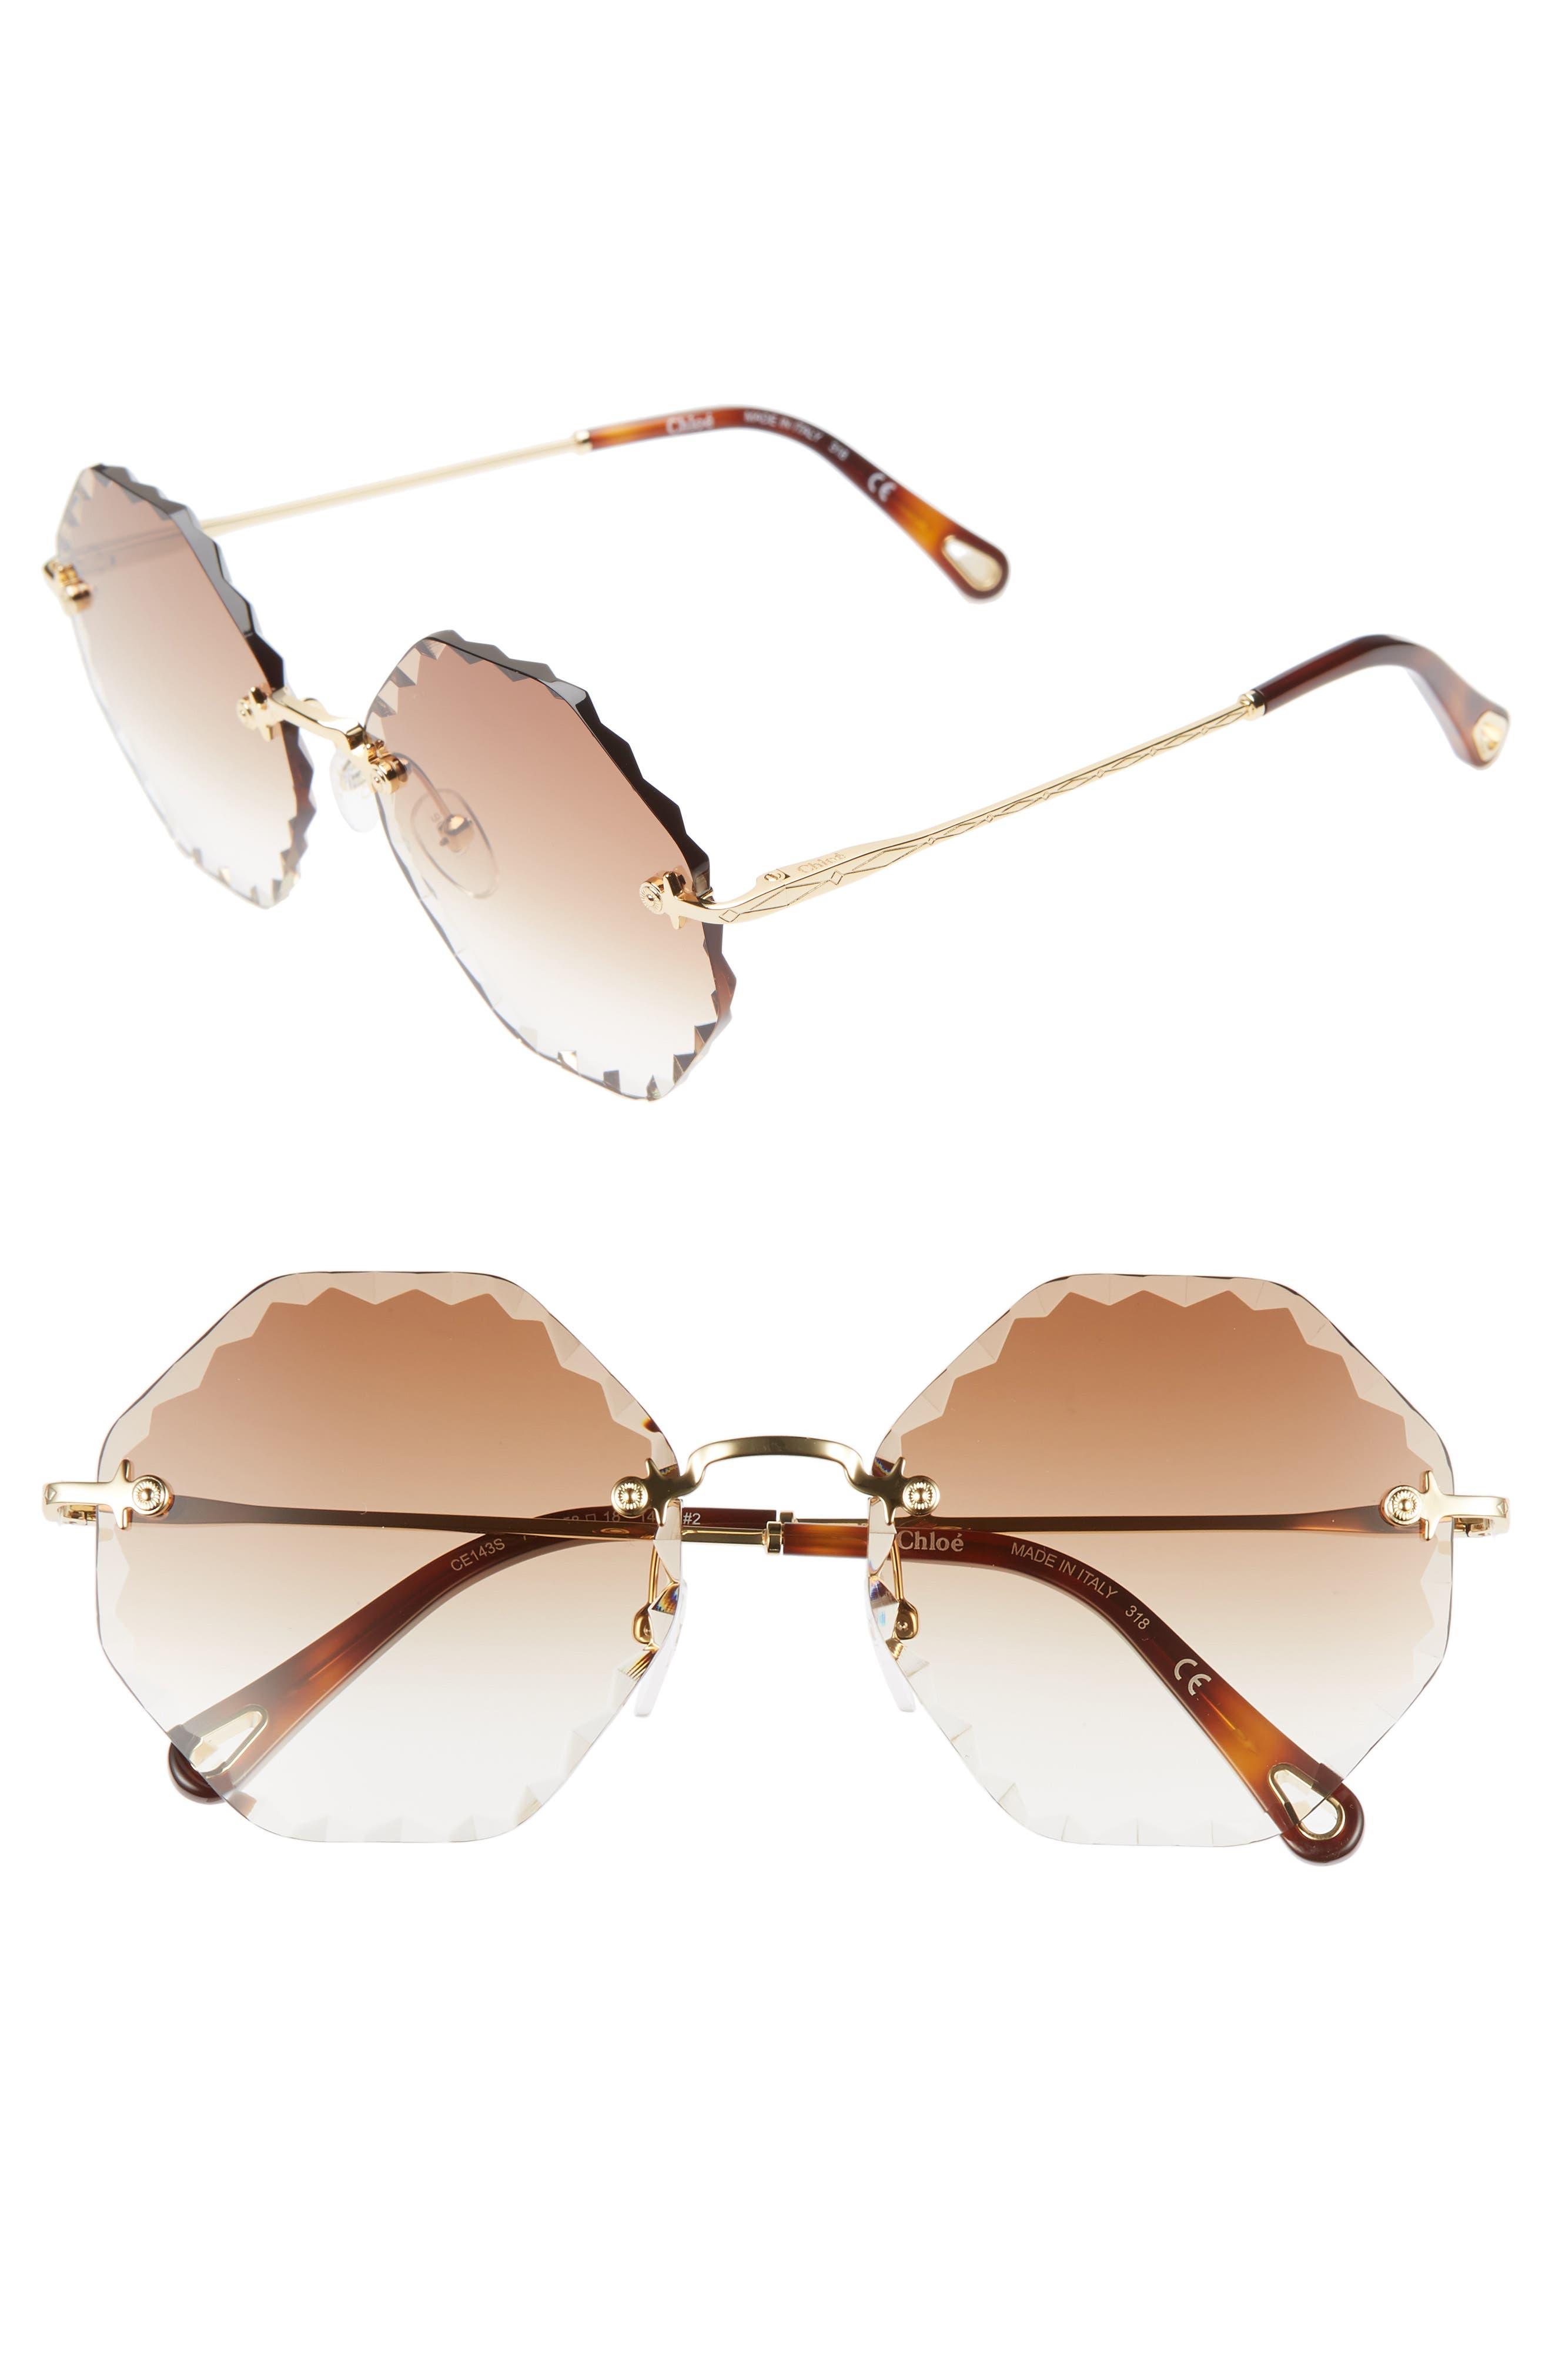 Chloe Rosie 5m Gradient Octagonal Rimless Sunglasses - Gold/ Gradient Brown